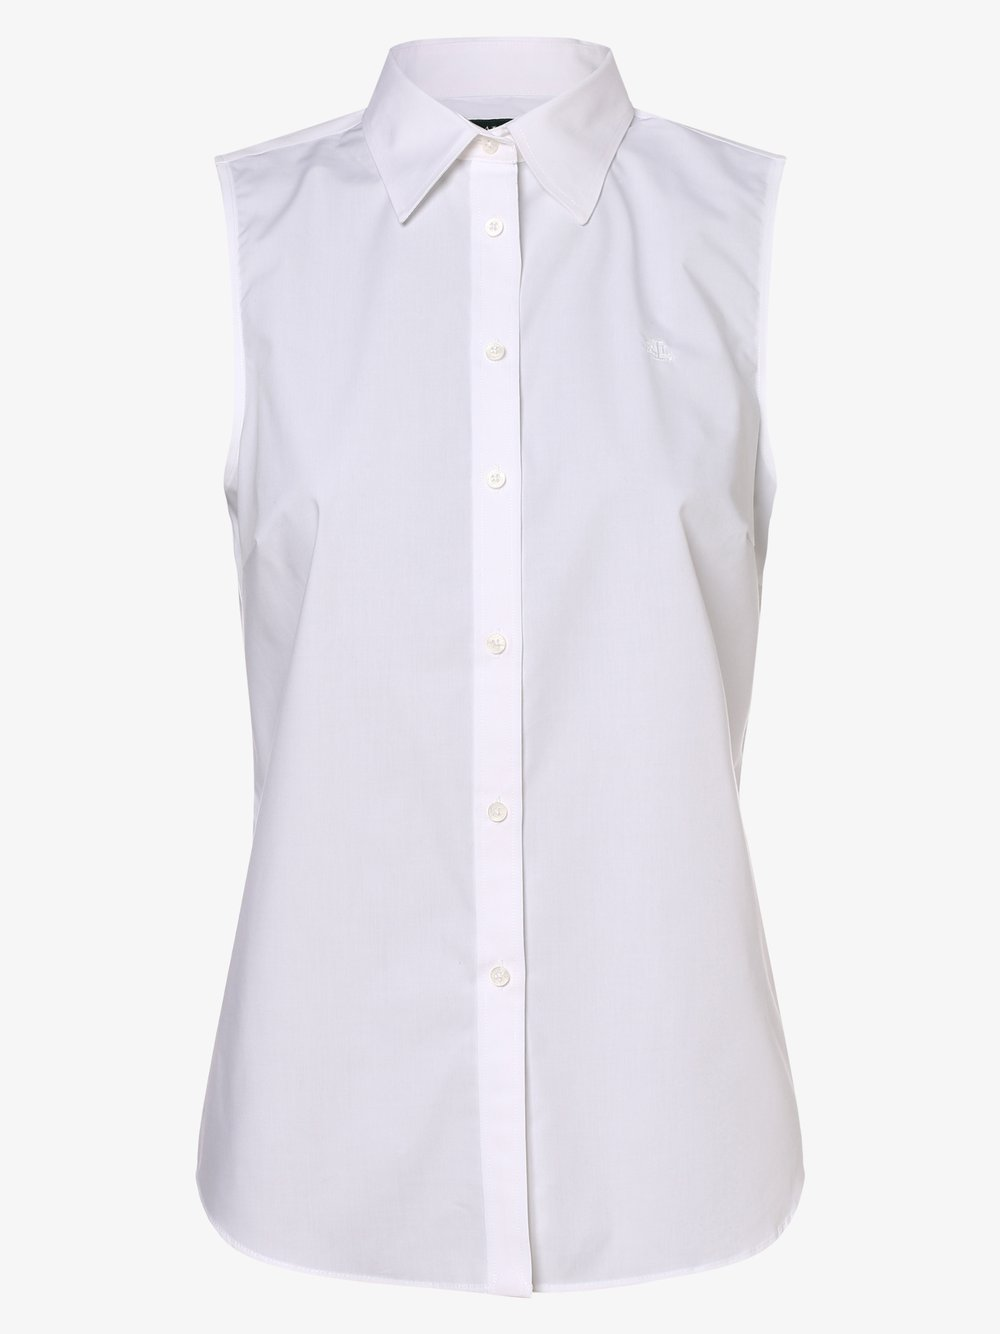 Lauren Ralph Lauren – Bluzka damska niewymagająca prasowania, biały Van Graaf 476828-0001-09970